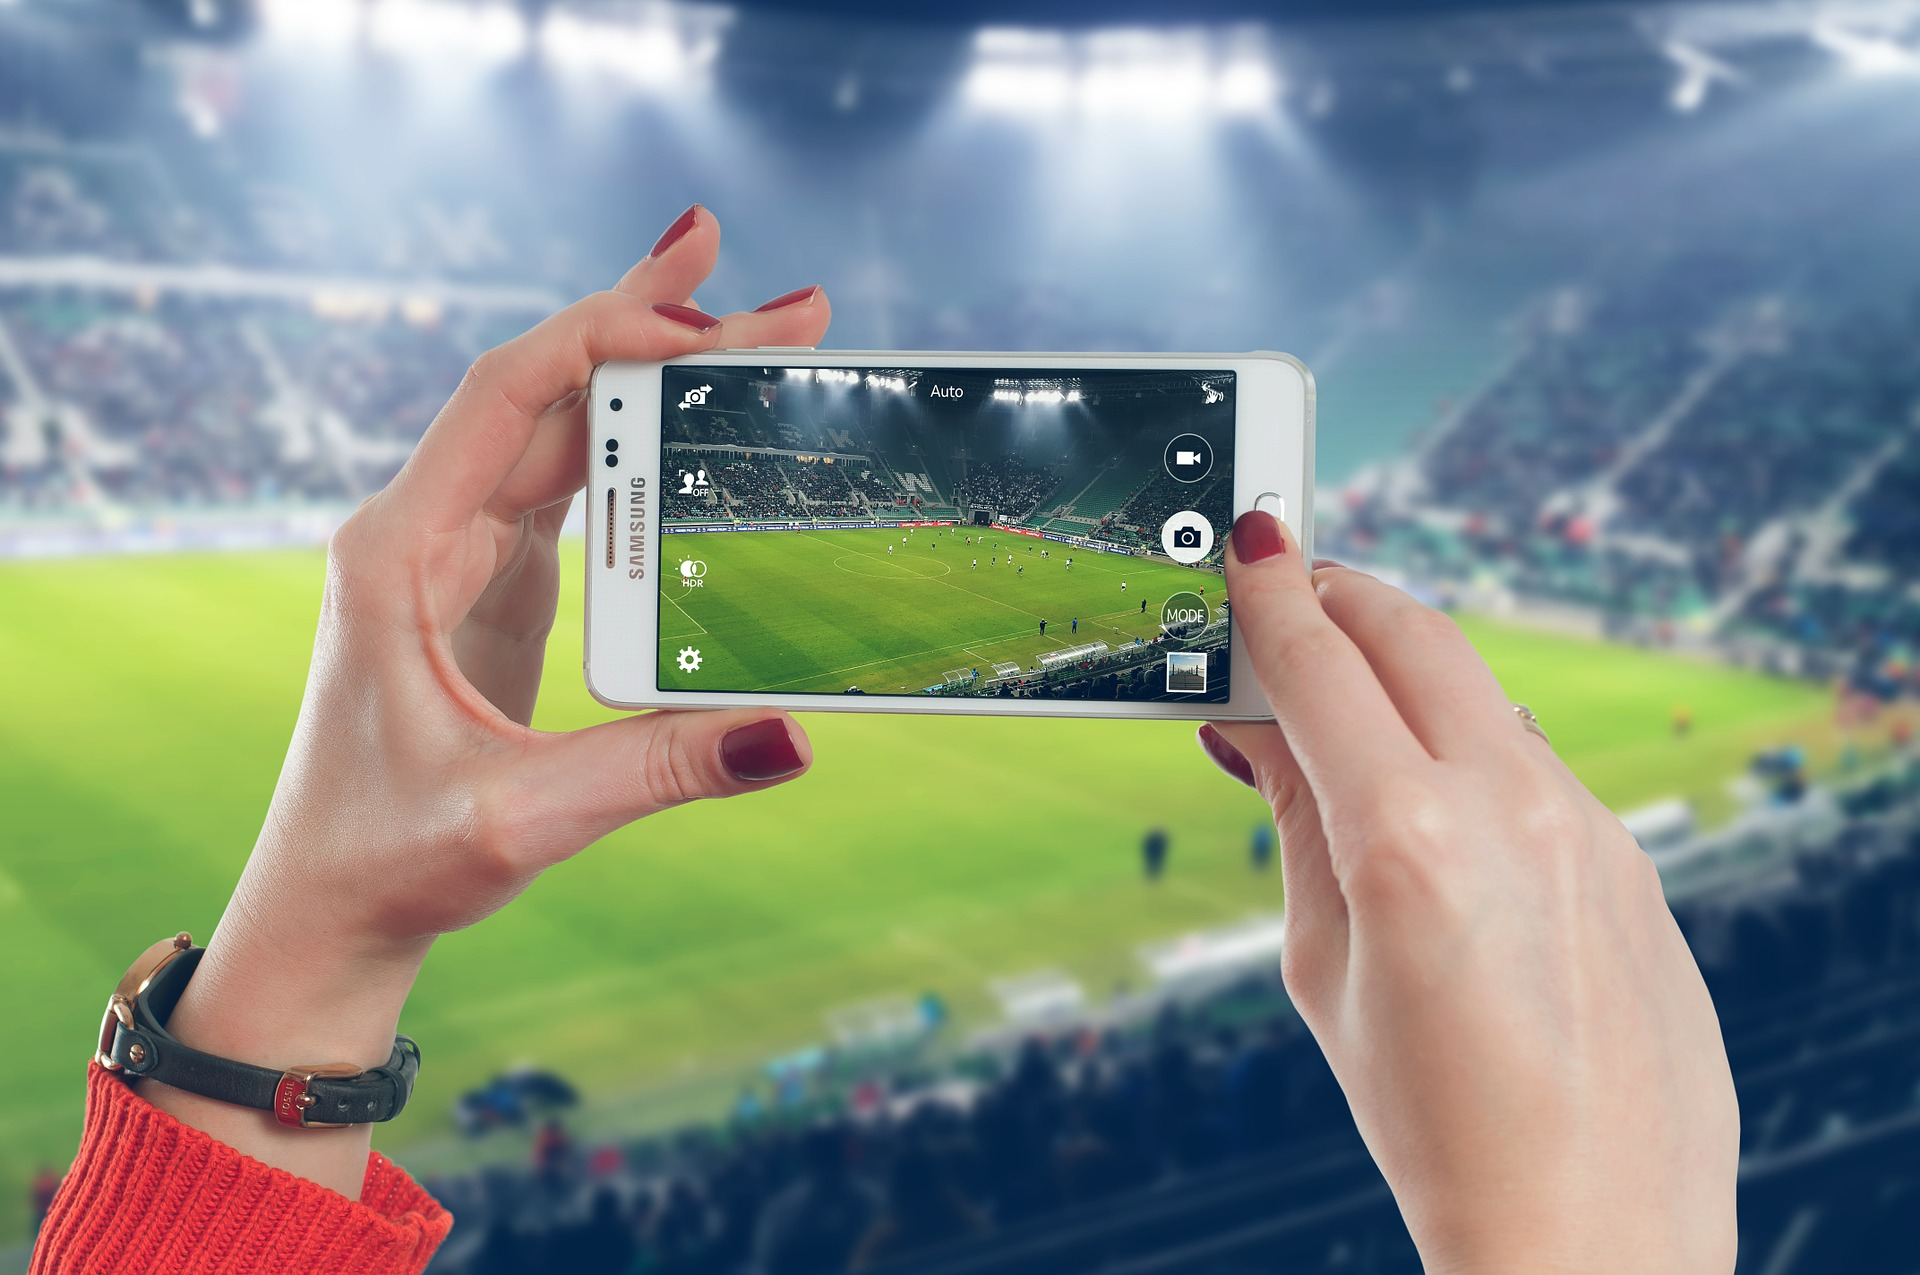 Sport + tehnologija = DIF Meetup